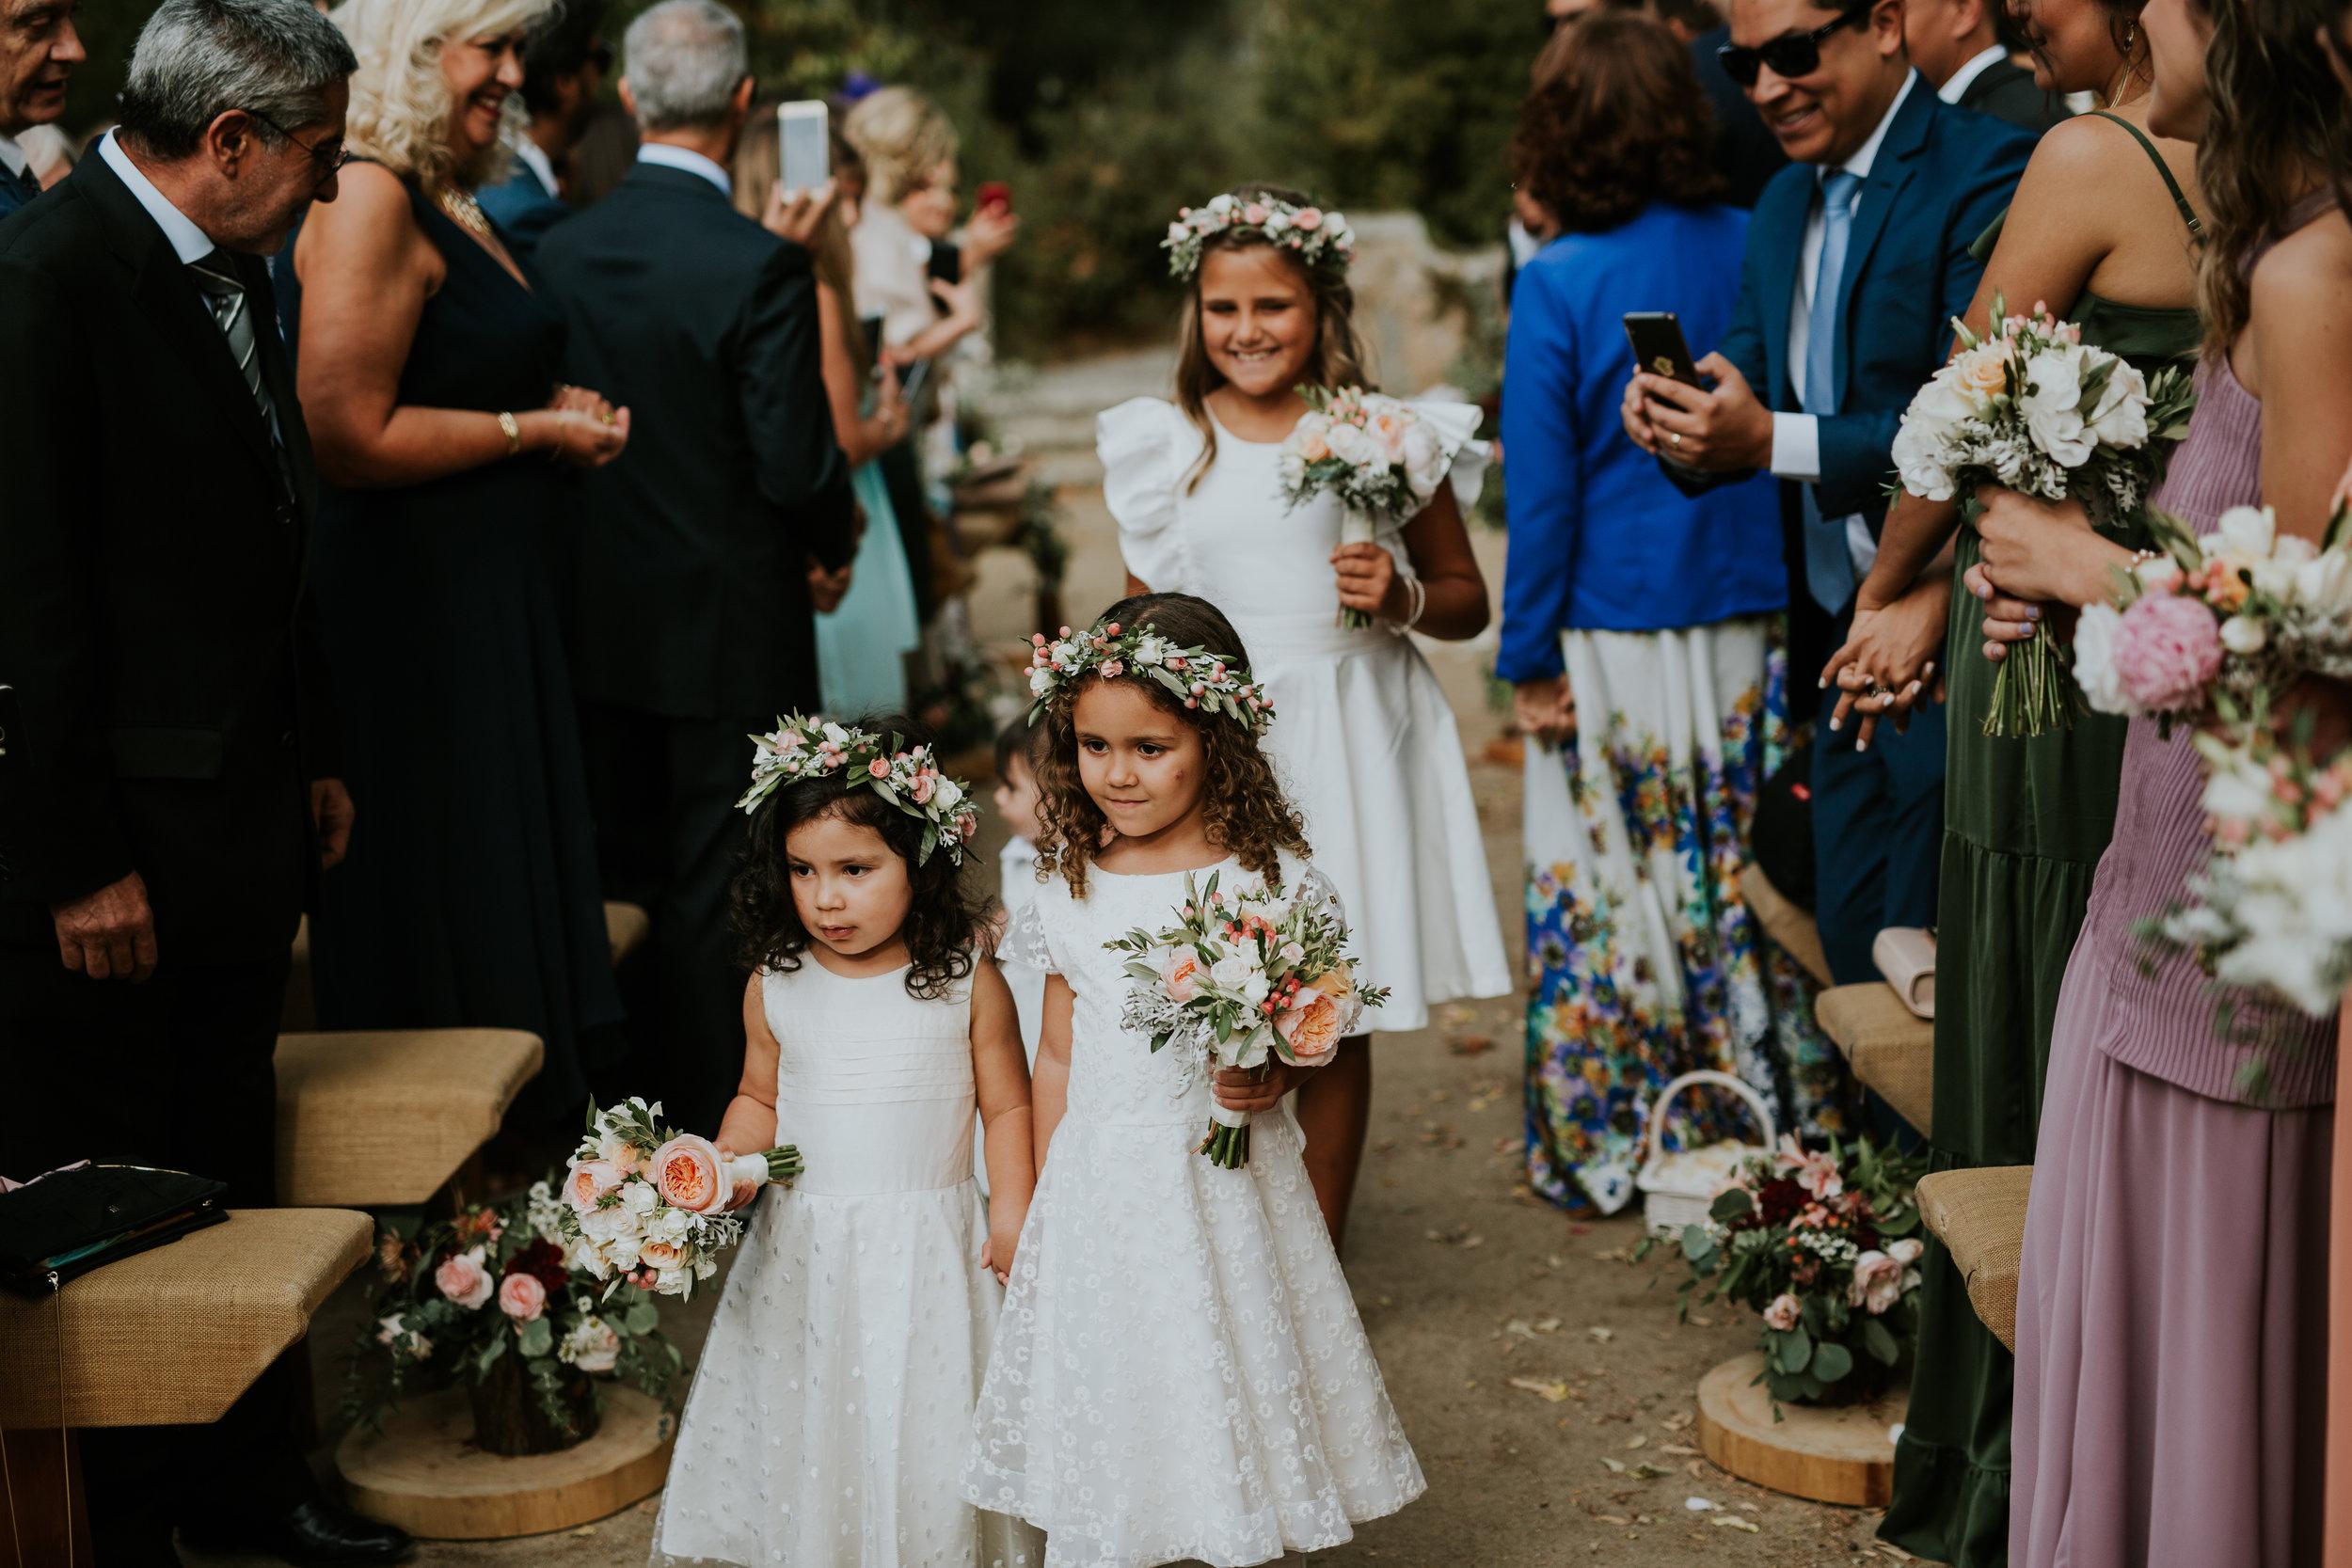 R&J206_ 09 setembro 2017 Wedding day_.jpg